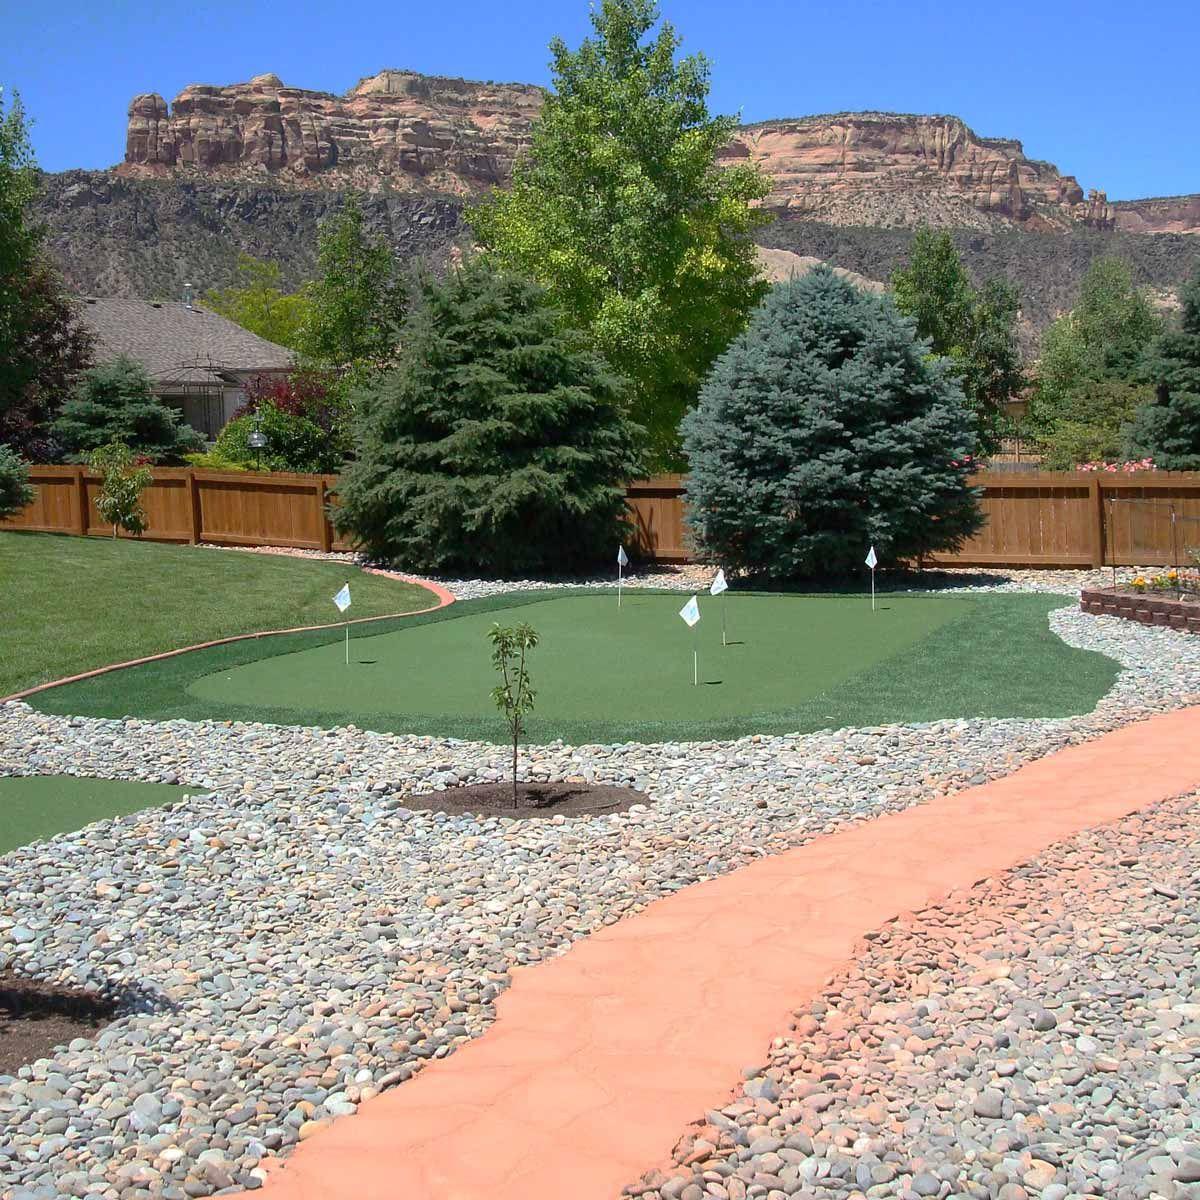 19 Crazy Cool Backyard Putting Greens in 2020   Backyard ...